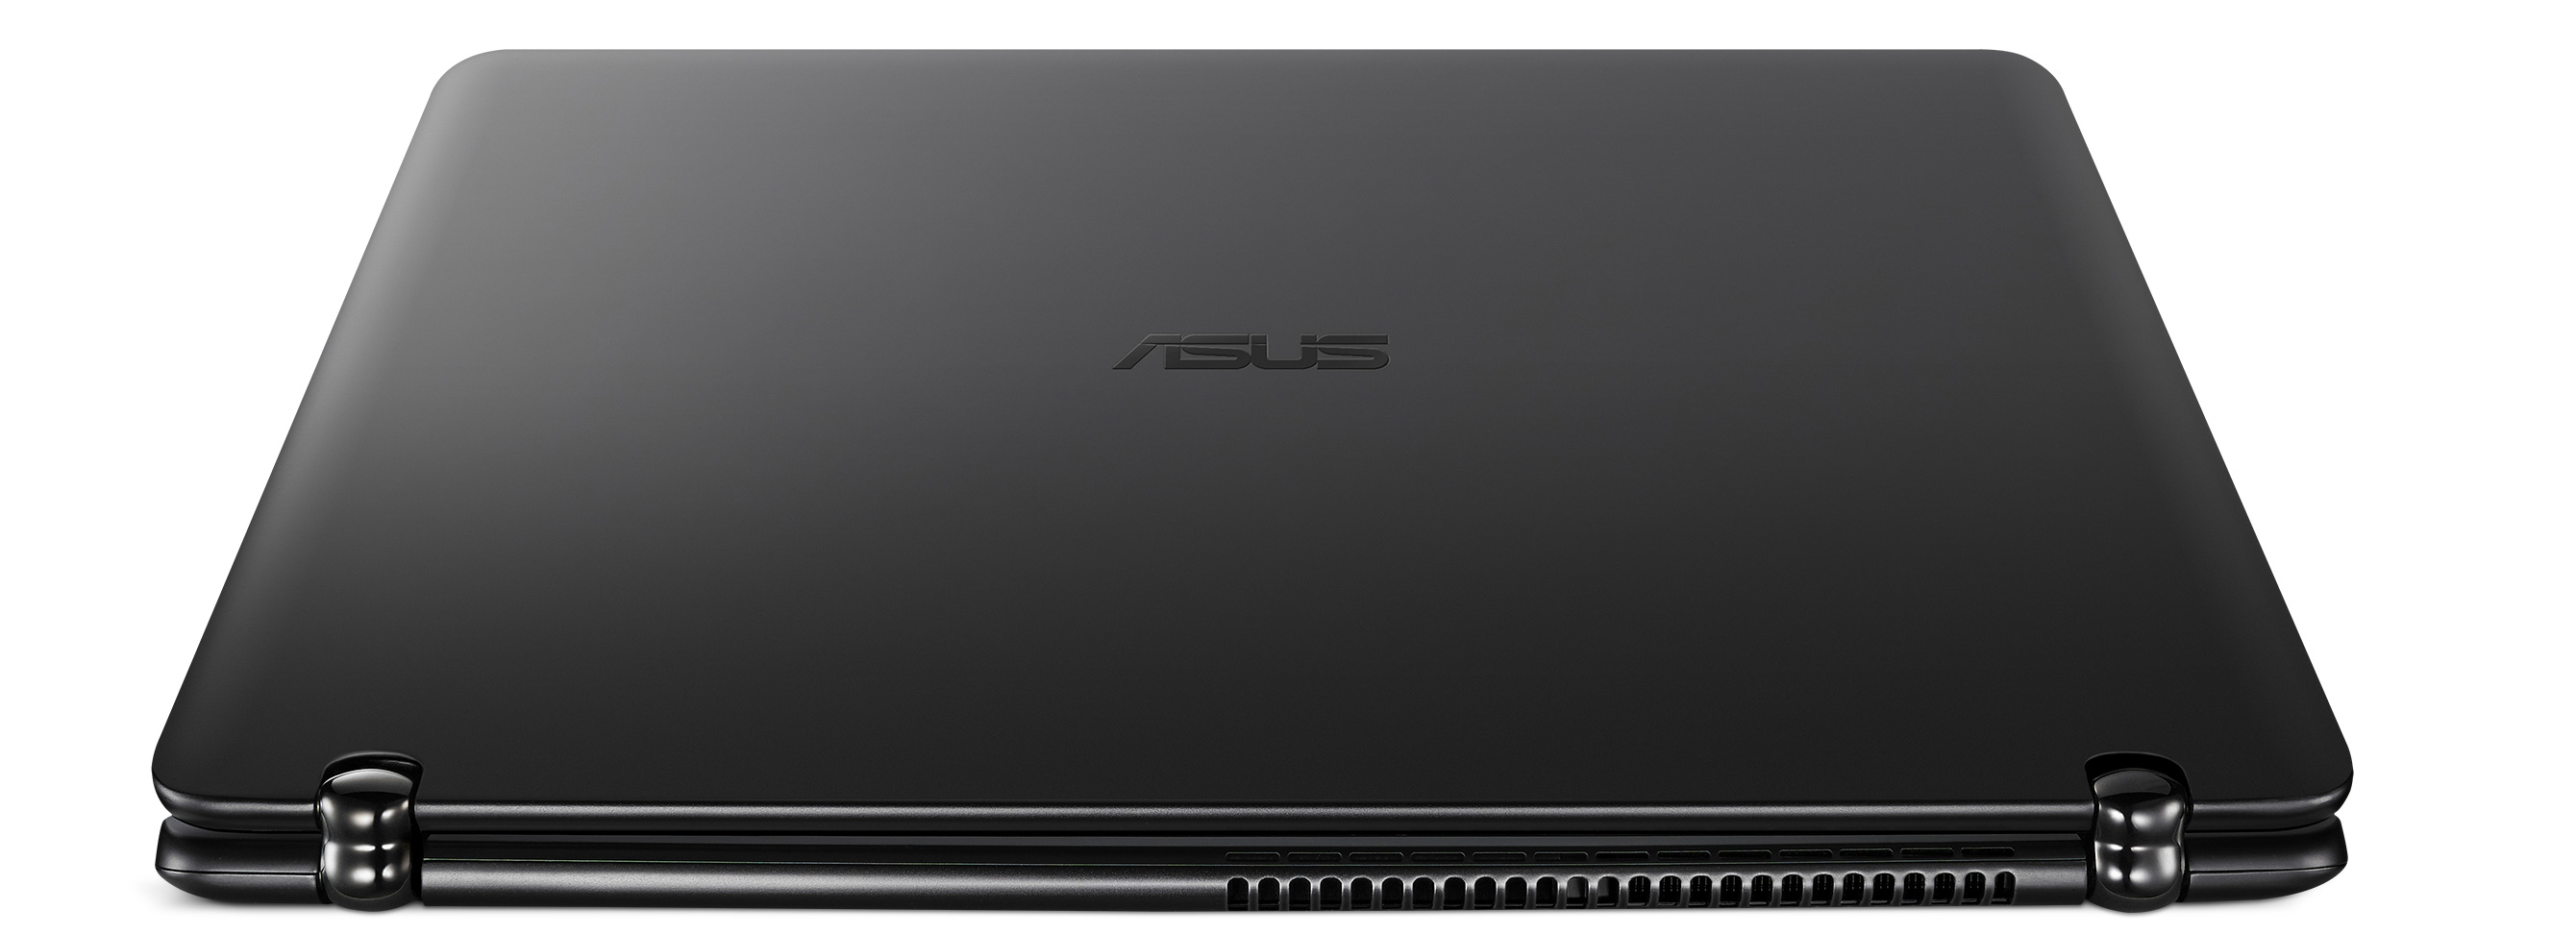 Q524UQ | Laptops | ASUS USA